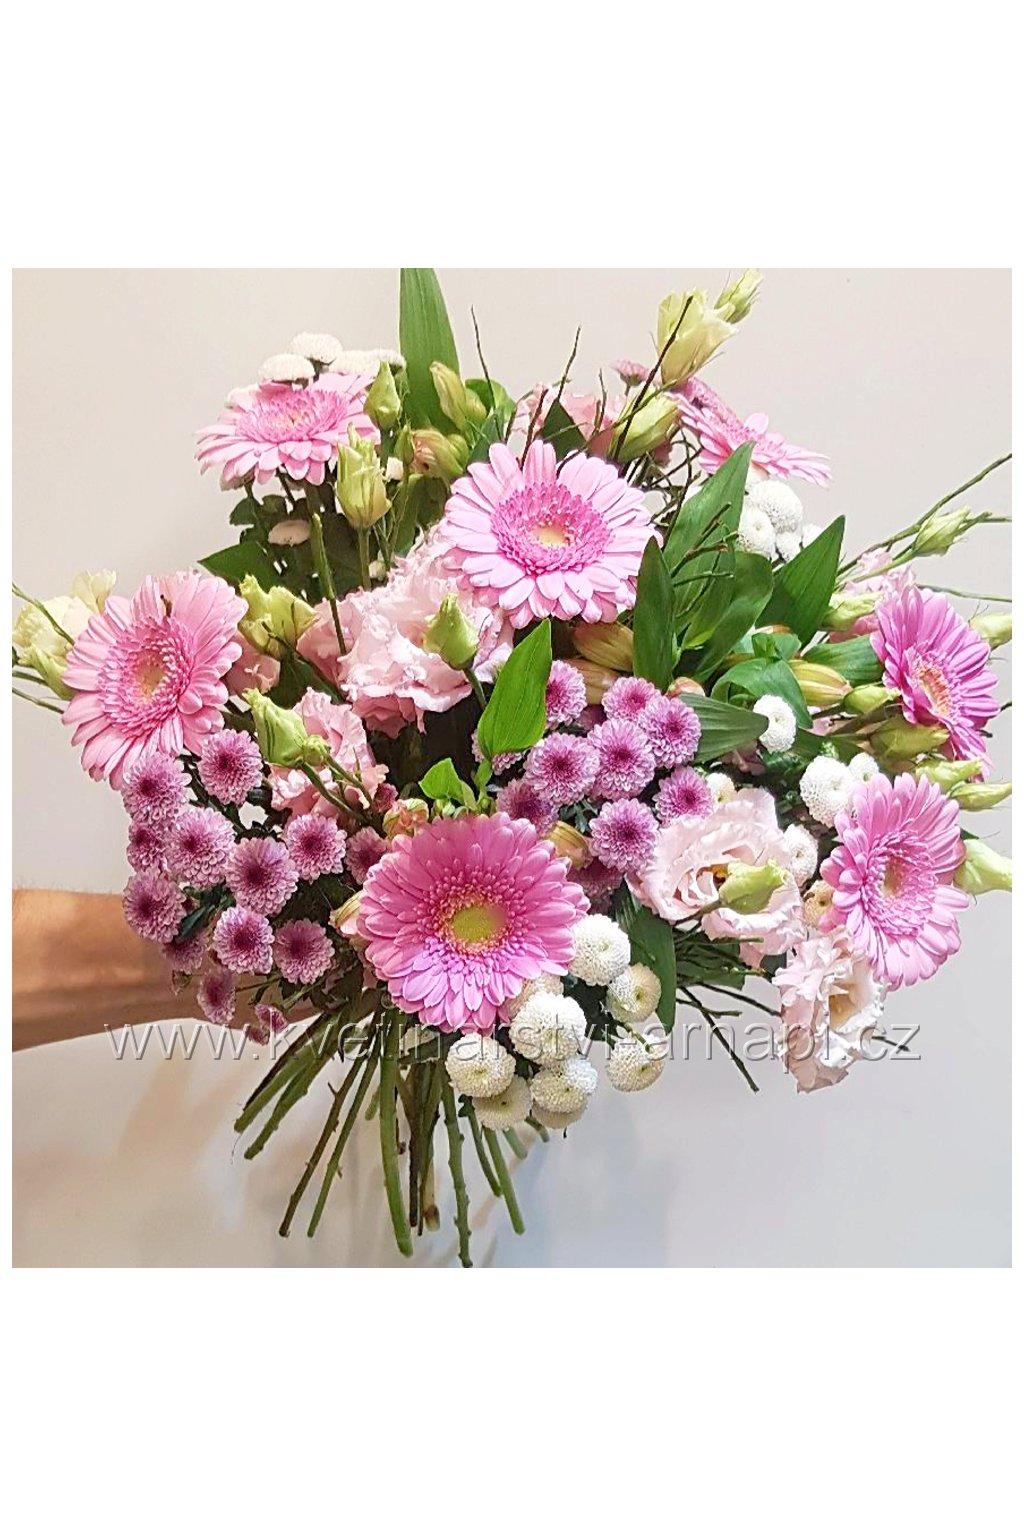 kytice germiny mix kvetinarstvi arnapi